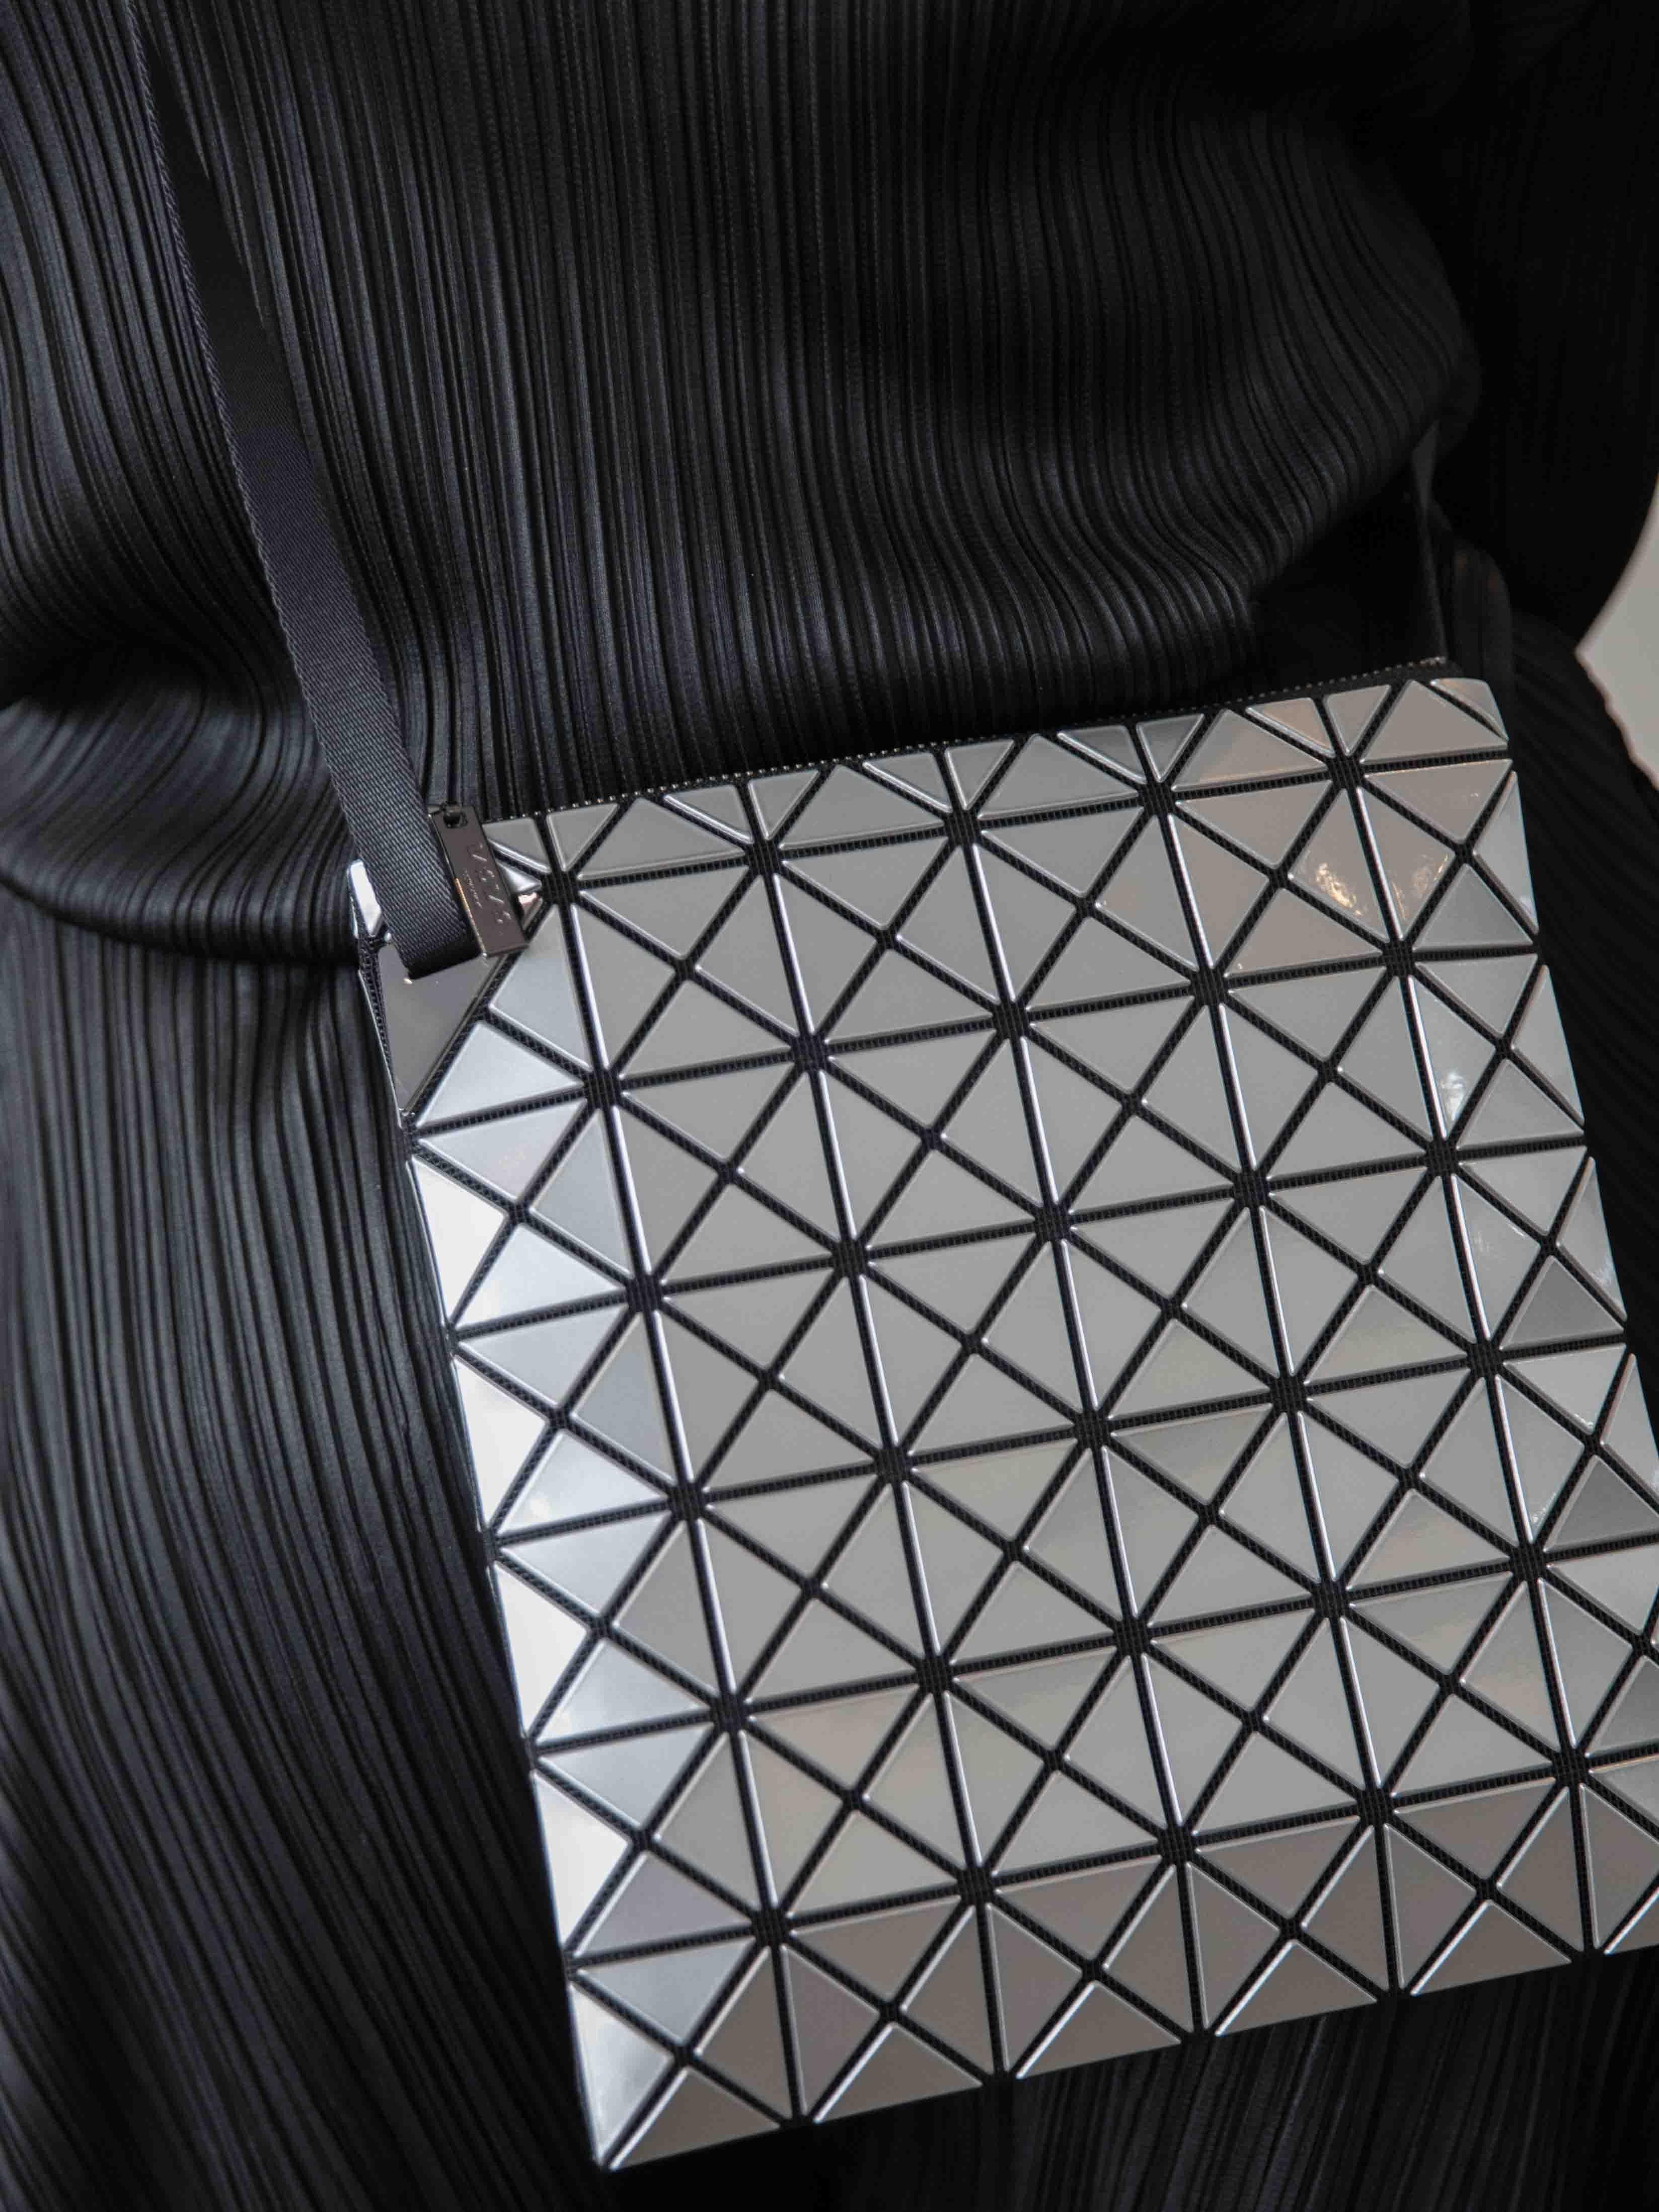 BAO BAO ISSEY MIYAKE Prism Shoulder Bag  e053ec803ae97